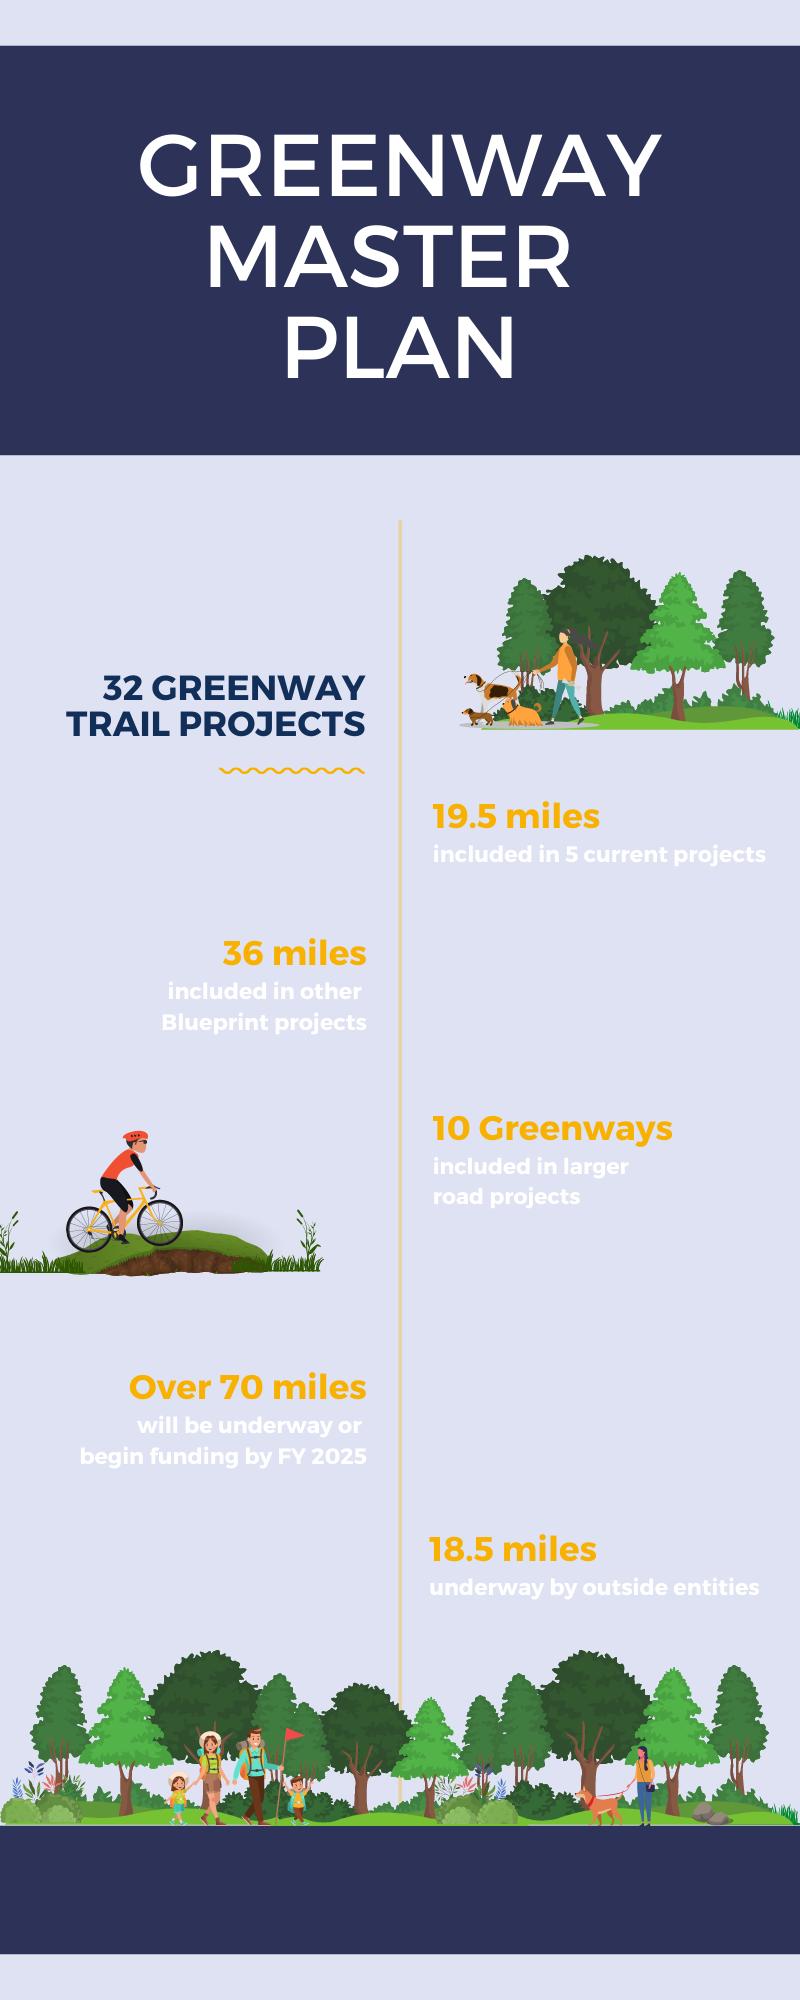 greenway master plan info graphic